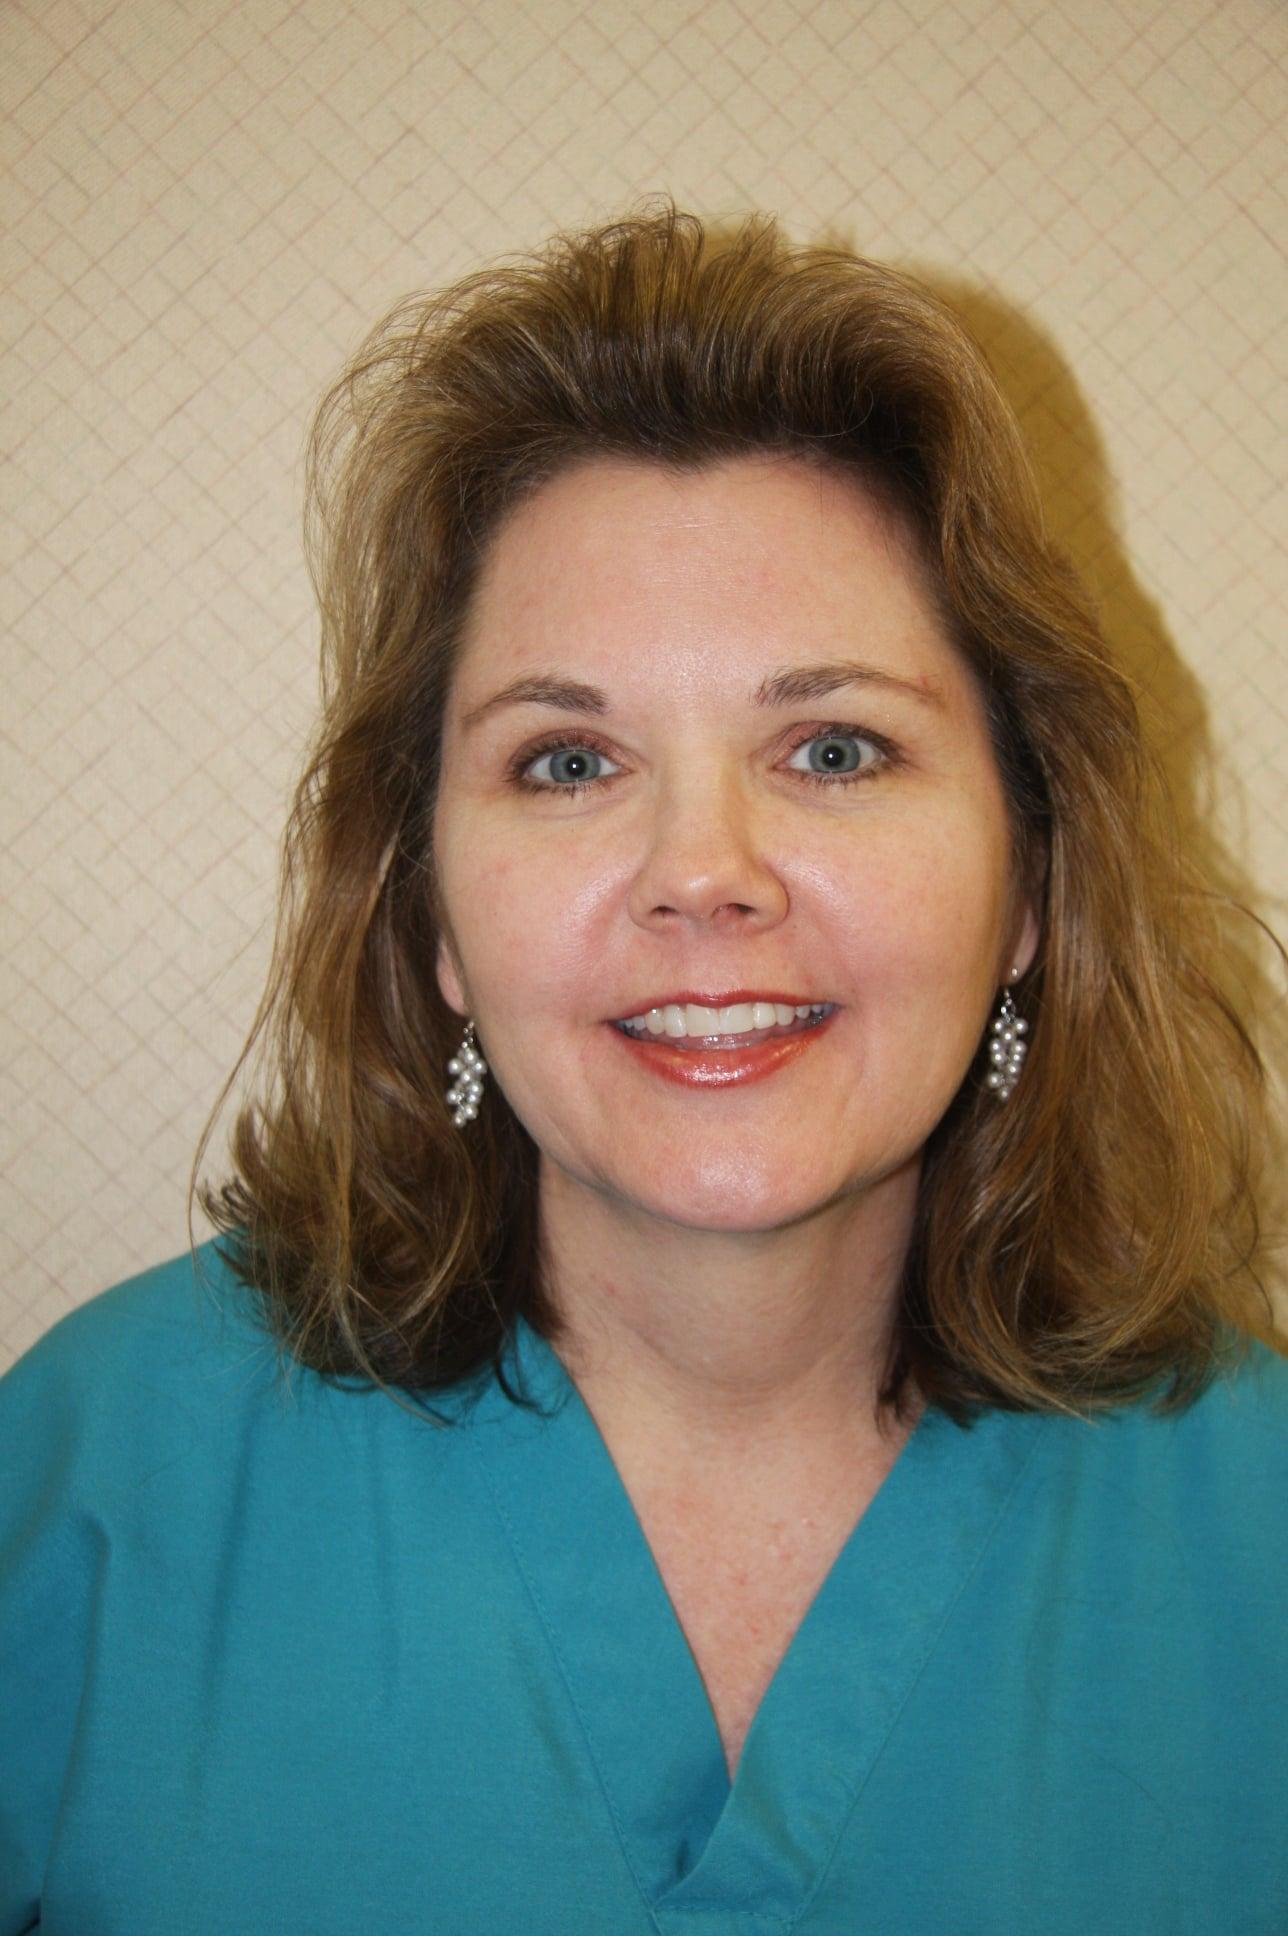 Tonya L Mccullough, MD Dermatology